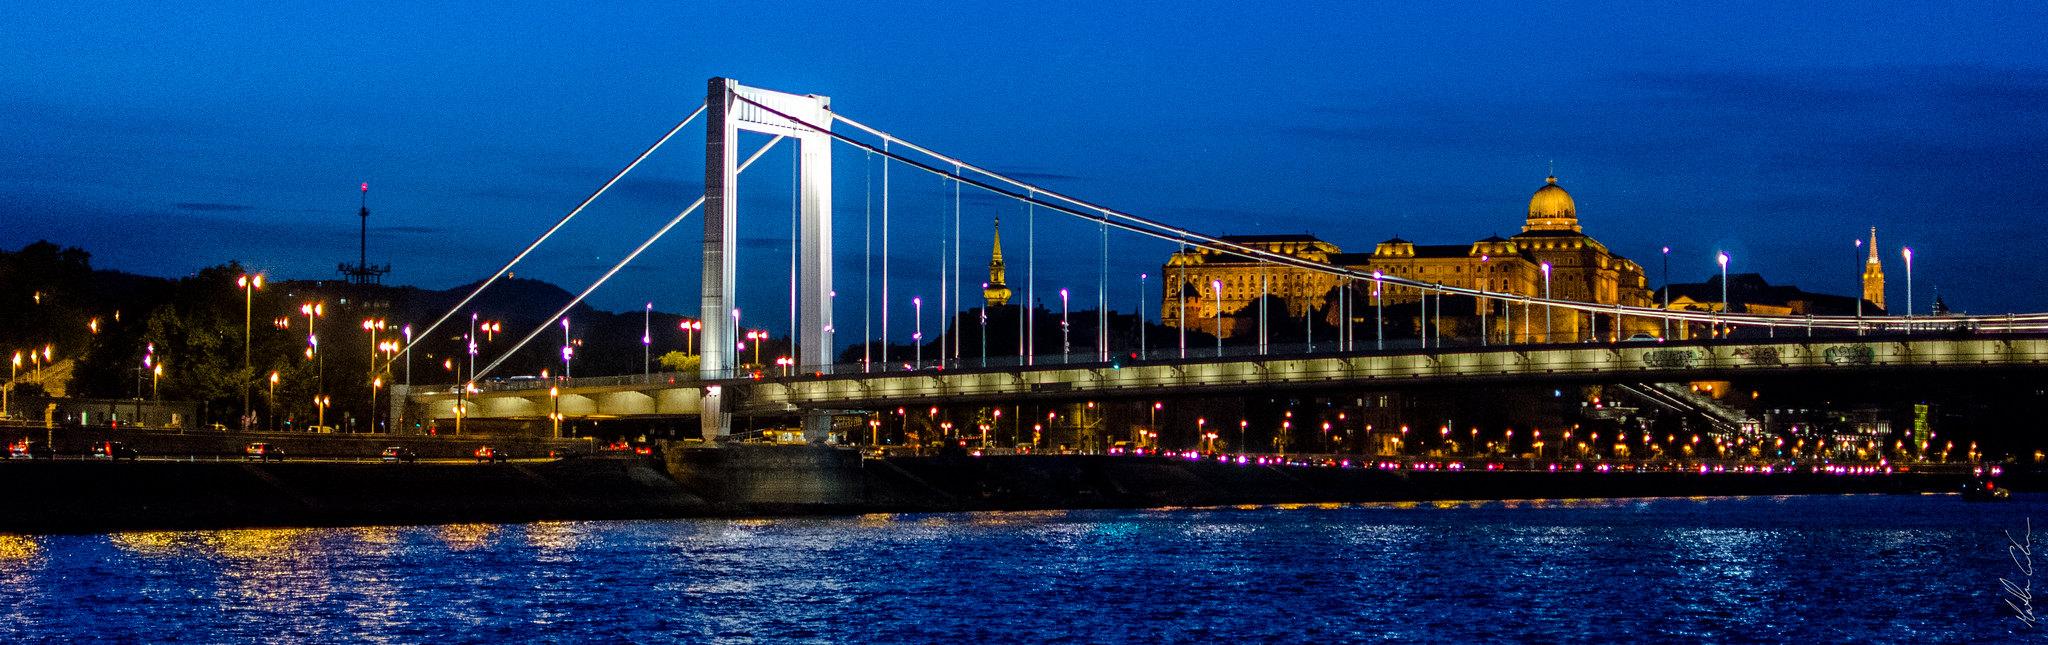 PragueVienneBudapest-Flickr-25